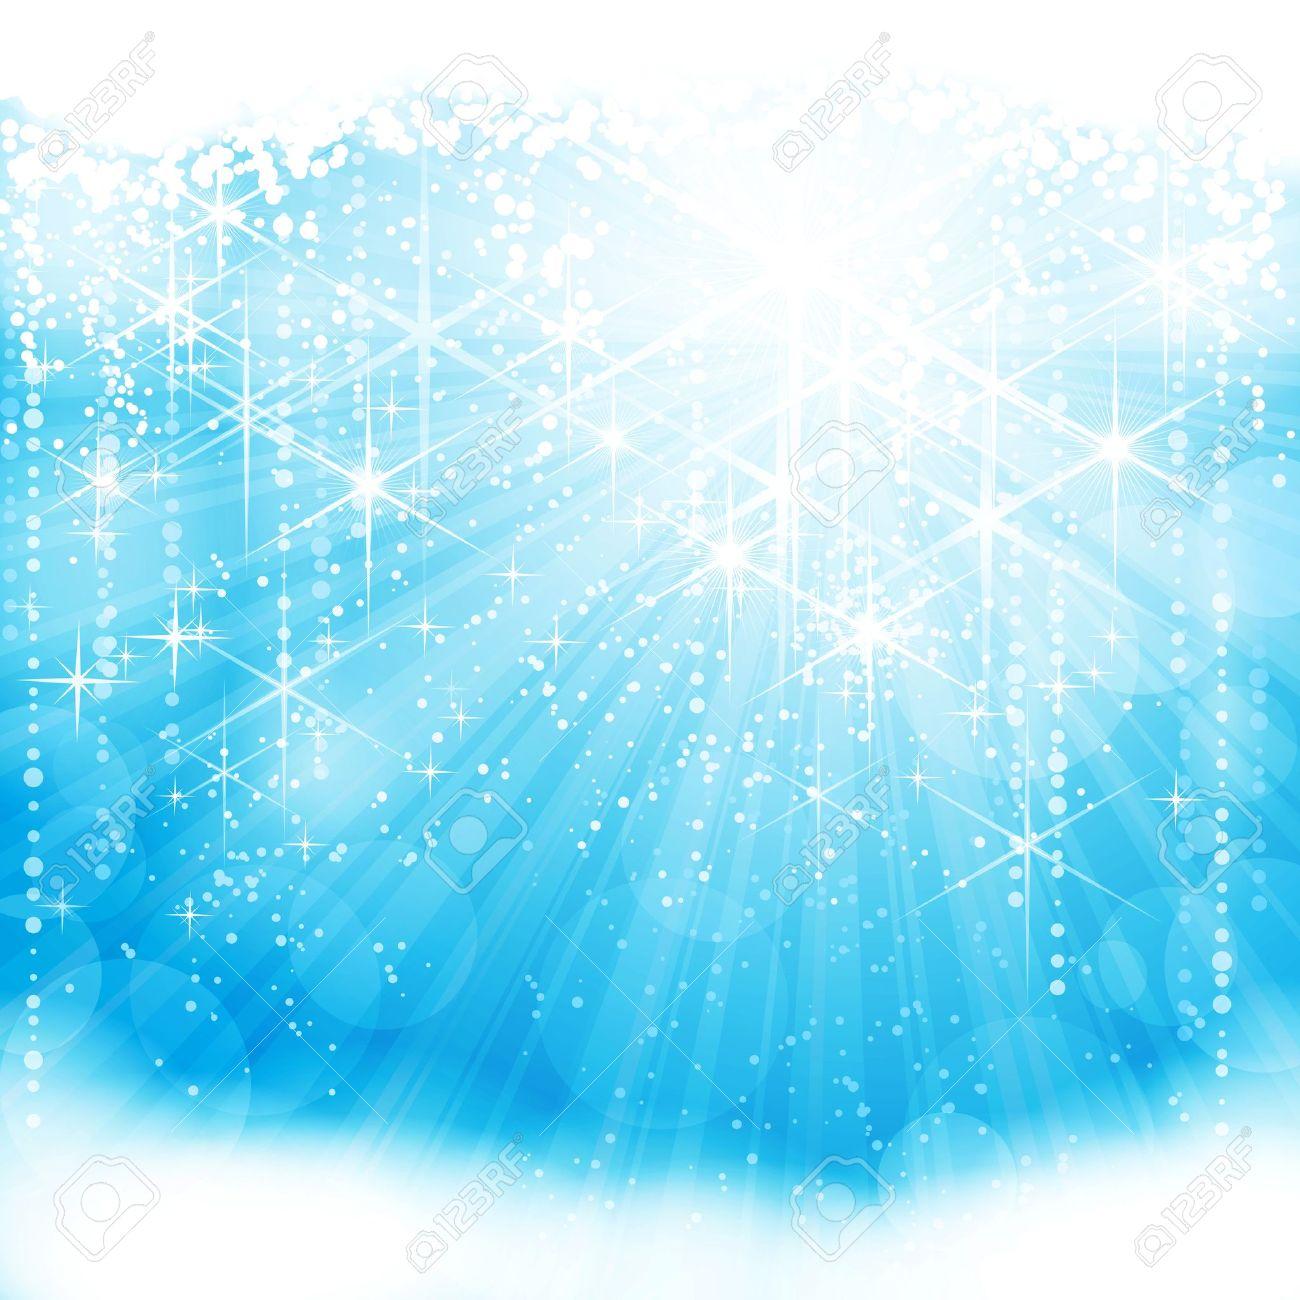 Light blue background - Festive Sparkling Light Blue Background Eps10 Stock Vector 11141413